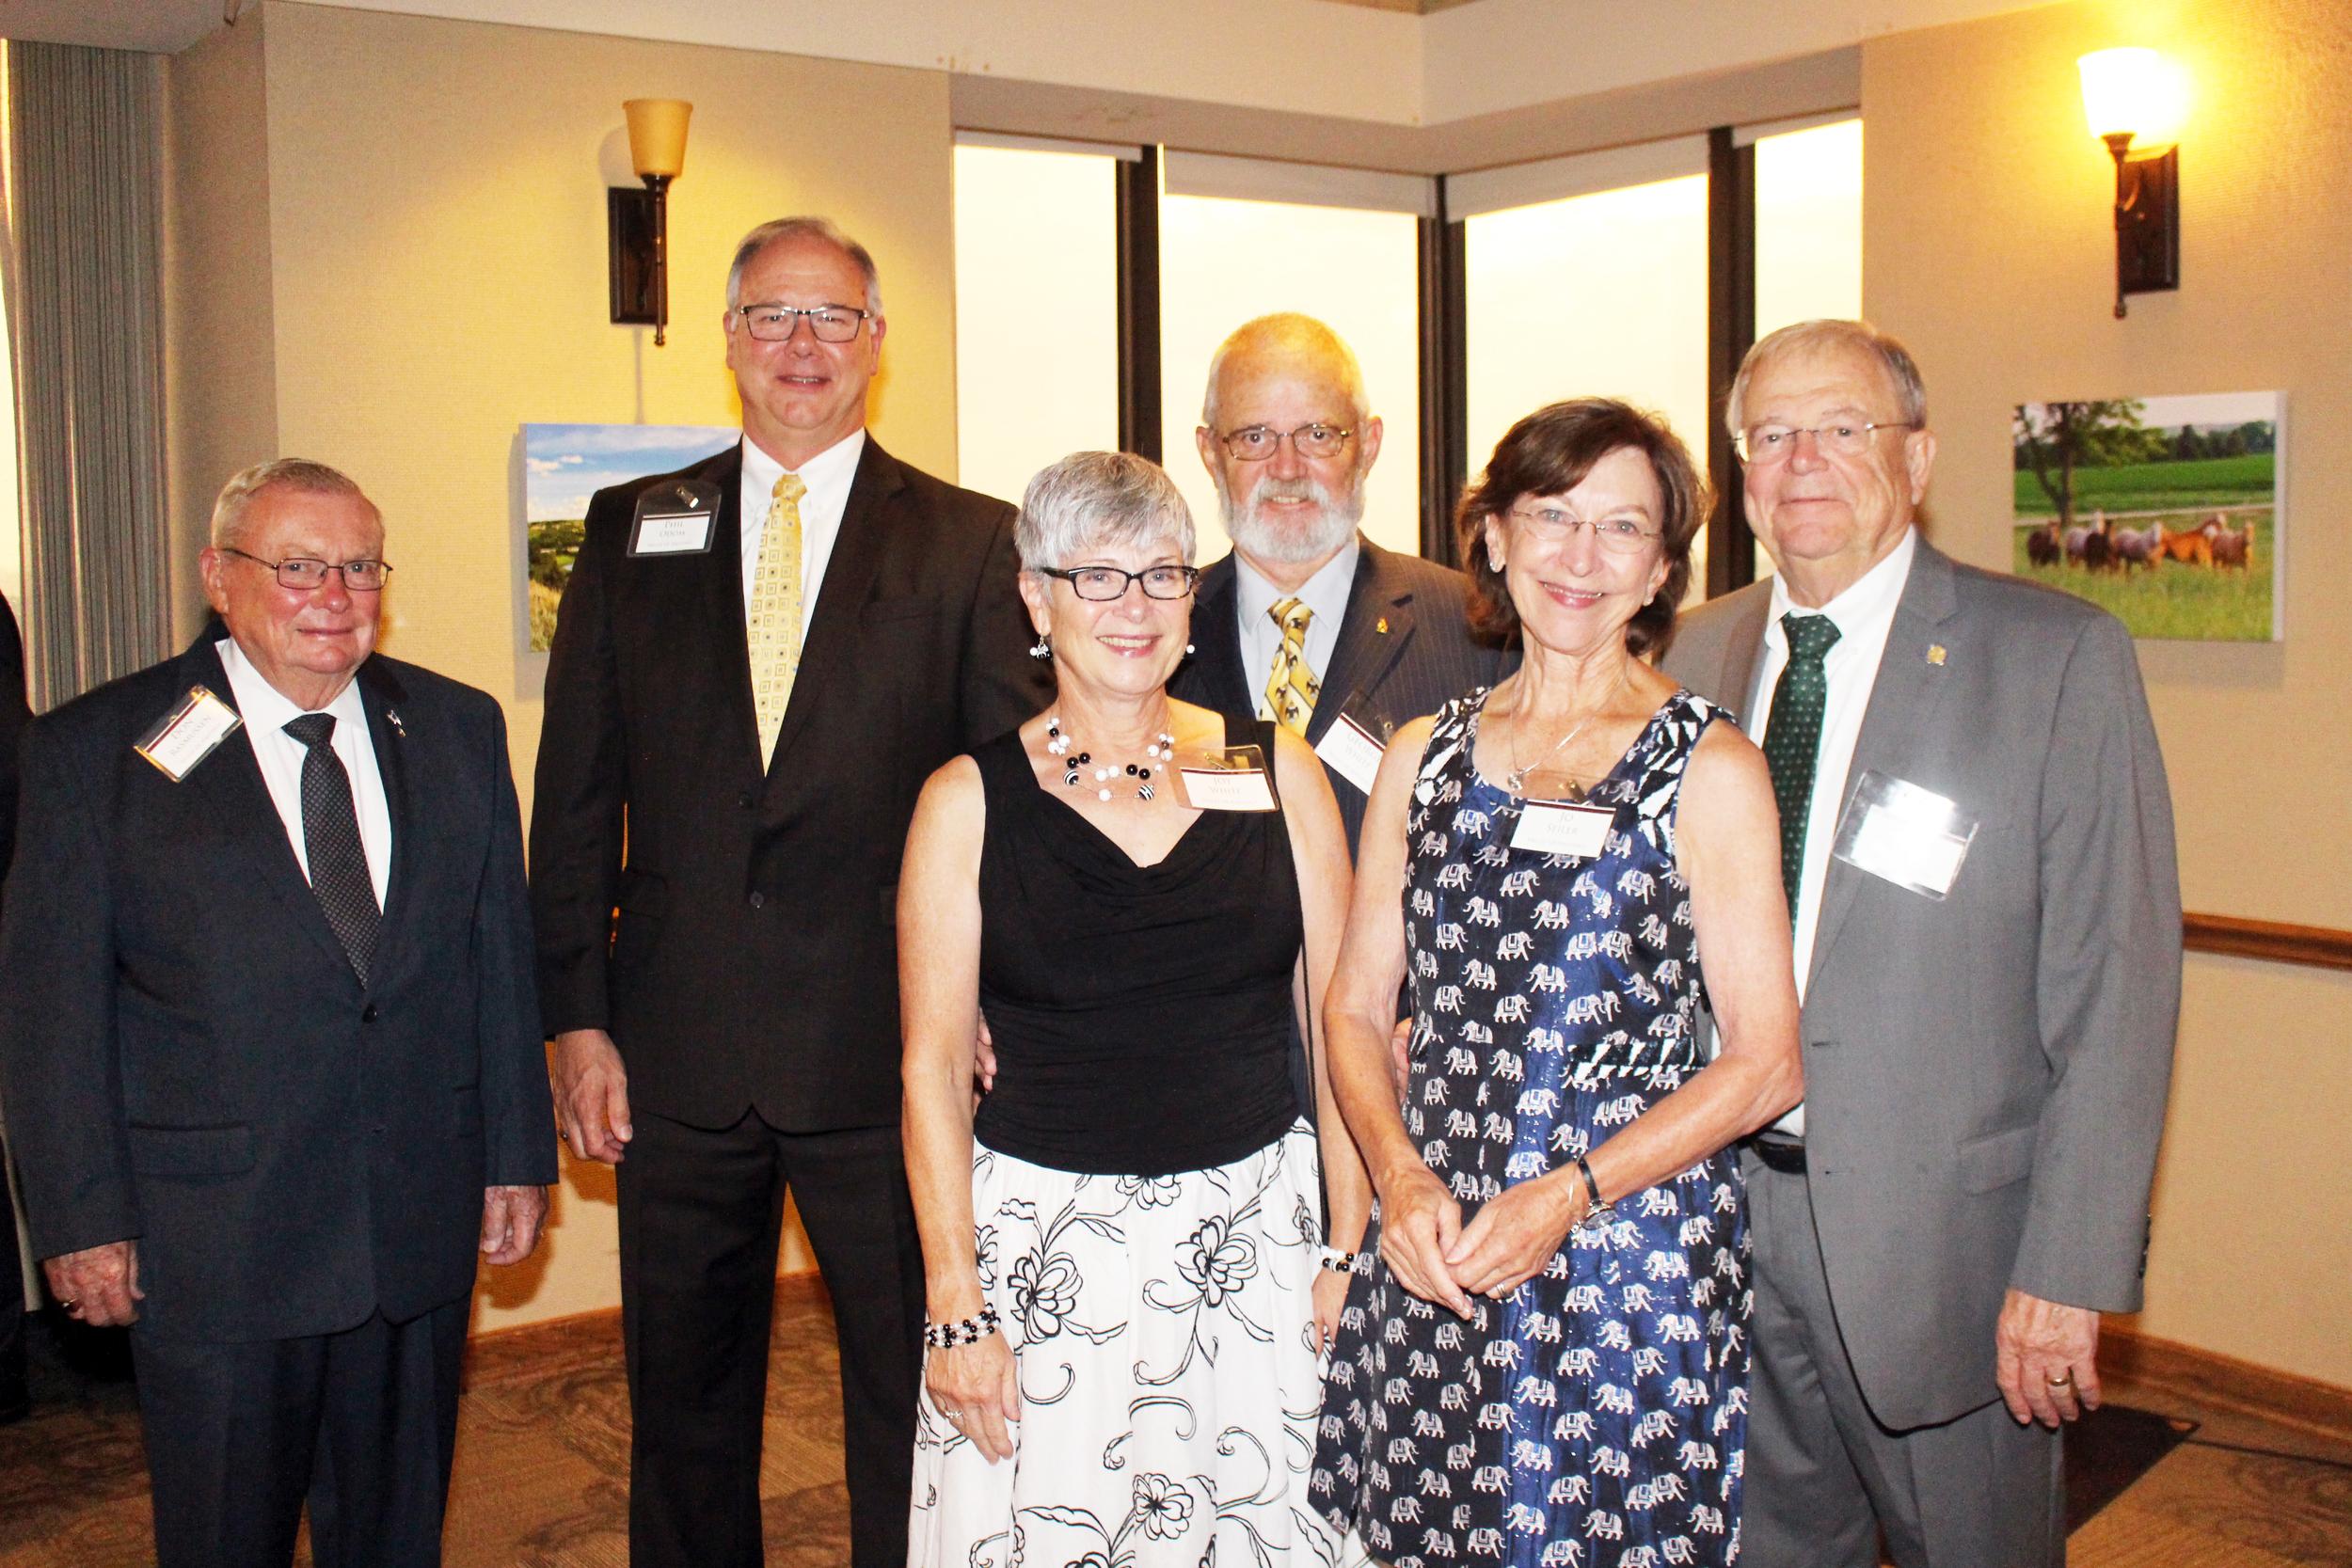 Guests from Central Nebraska Scottish Rite in Hastings